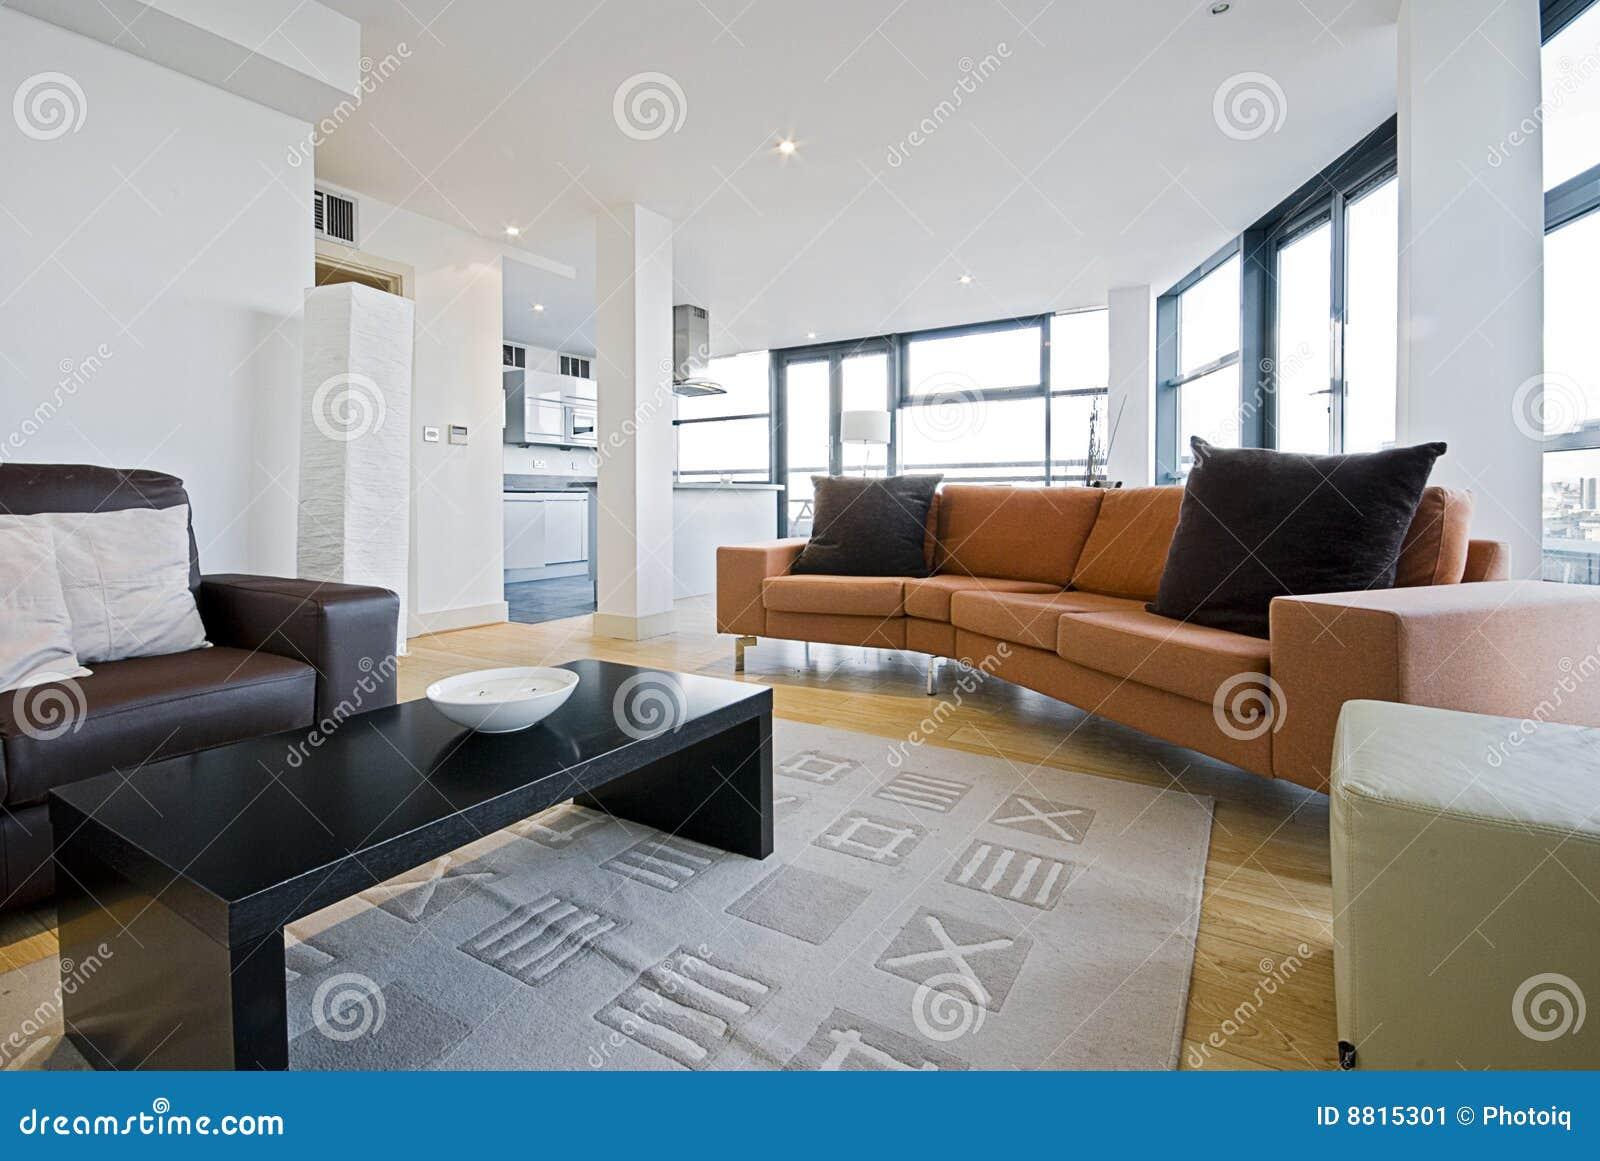 Woonkamer met oranje bank stock afbeelding beeld 8815301 - Afbeelding eigentijdse woonkamer ...